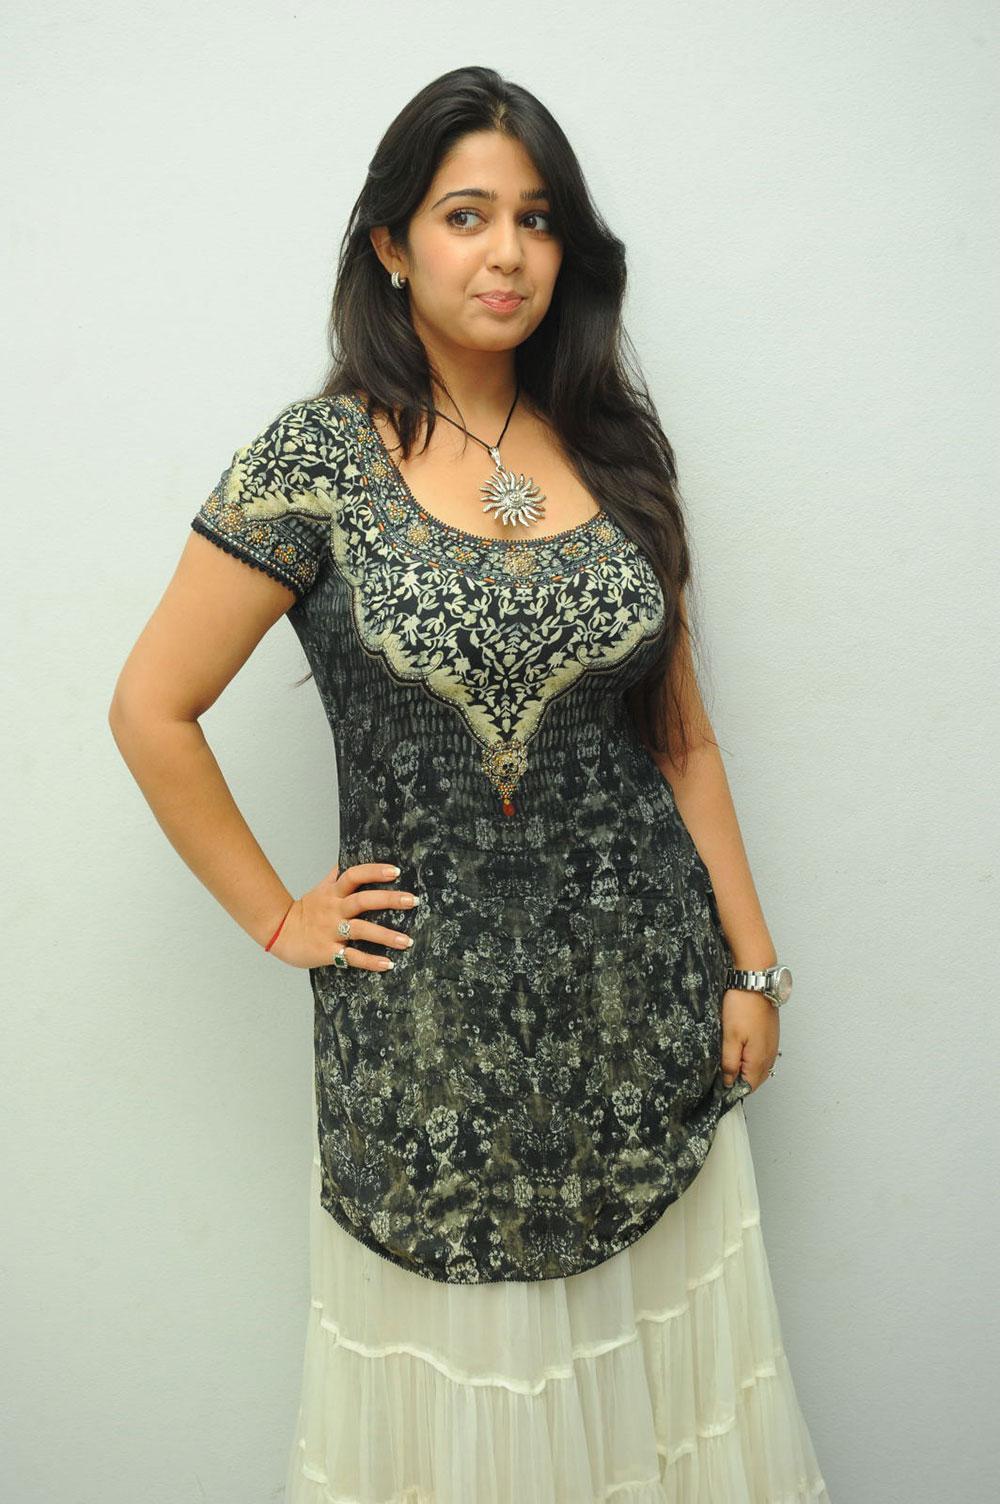 Charmi kaur big fair  gorgeous girl at prema oka maikam audio launch